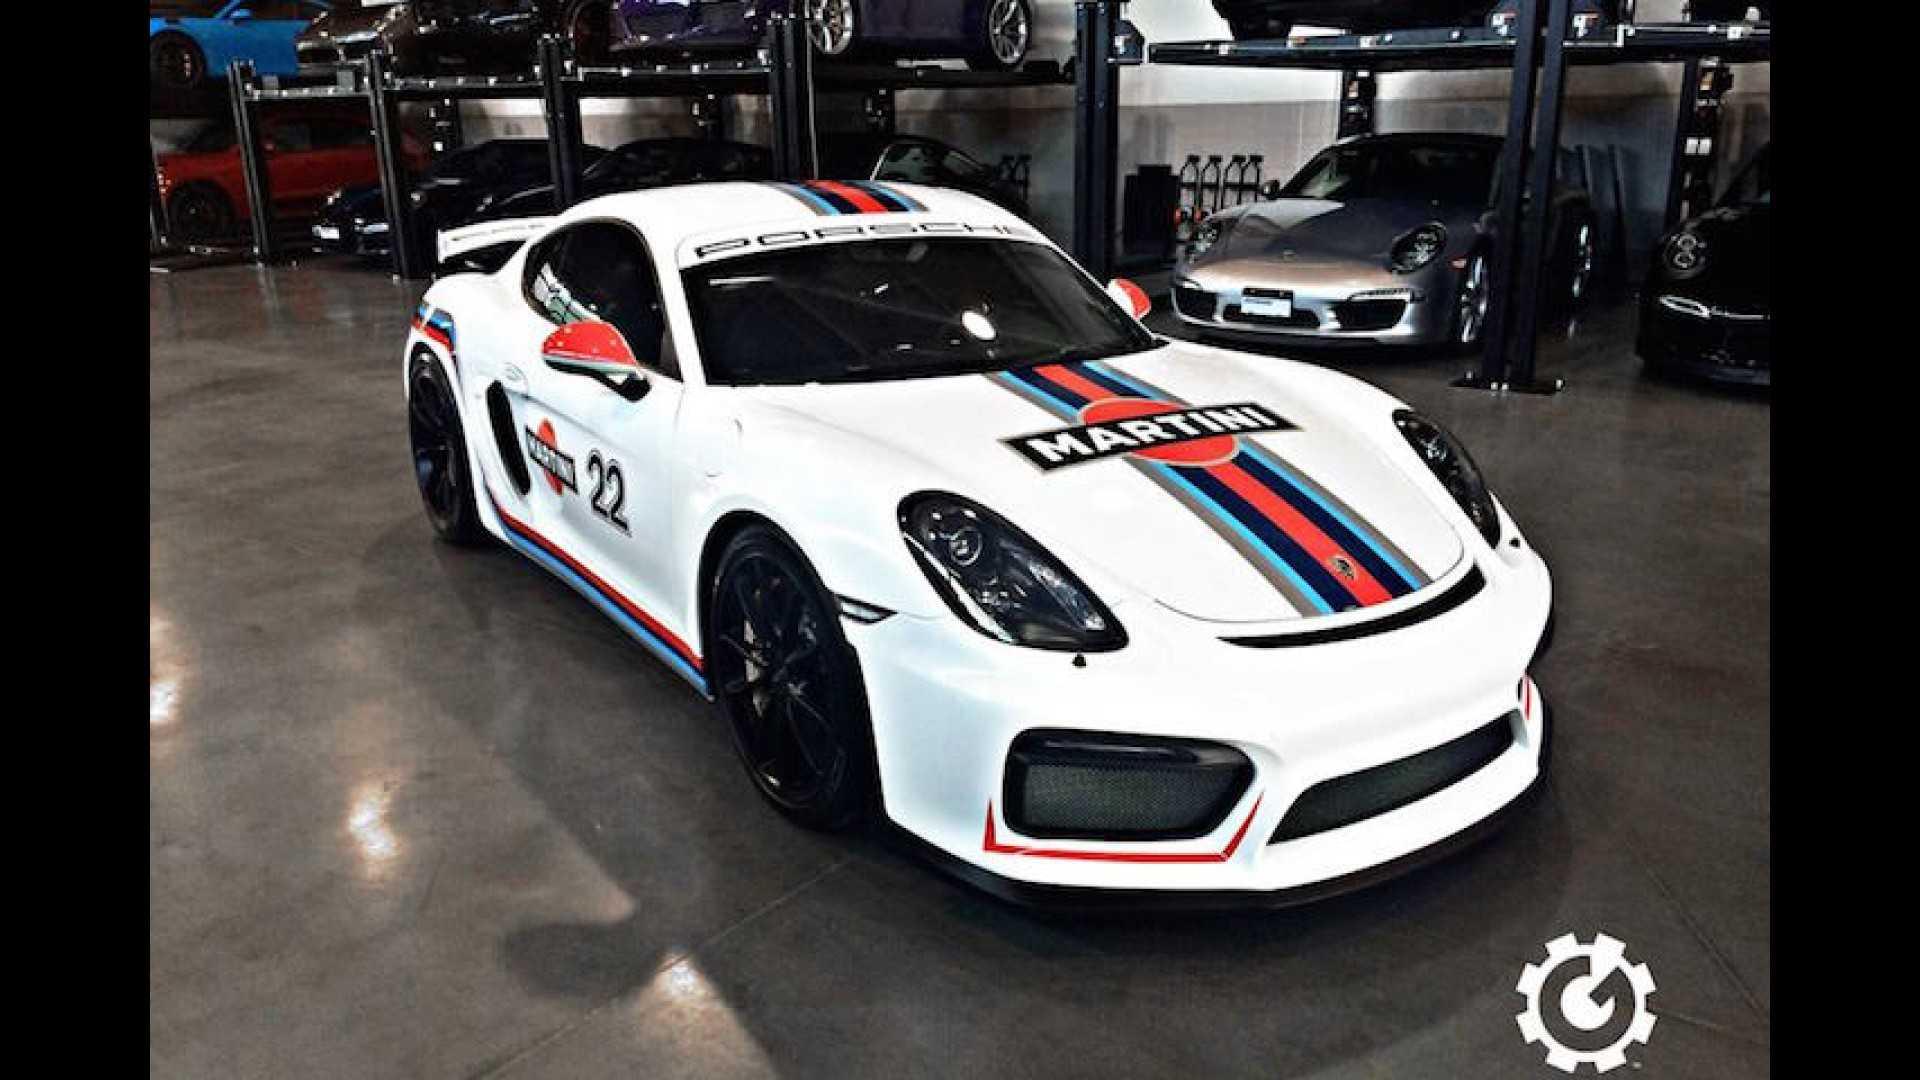 Porsche Cayman Gt4 Looks Like A Proper Race Car In Martini Livery